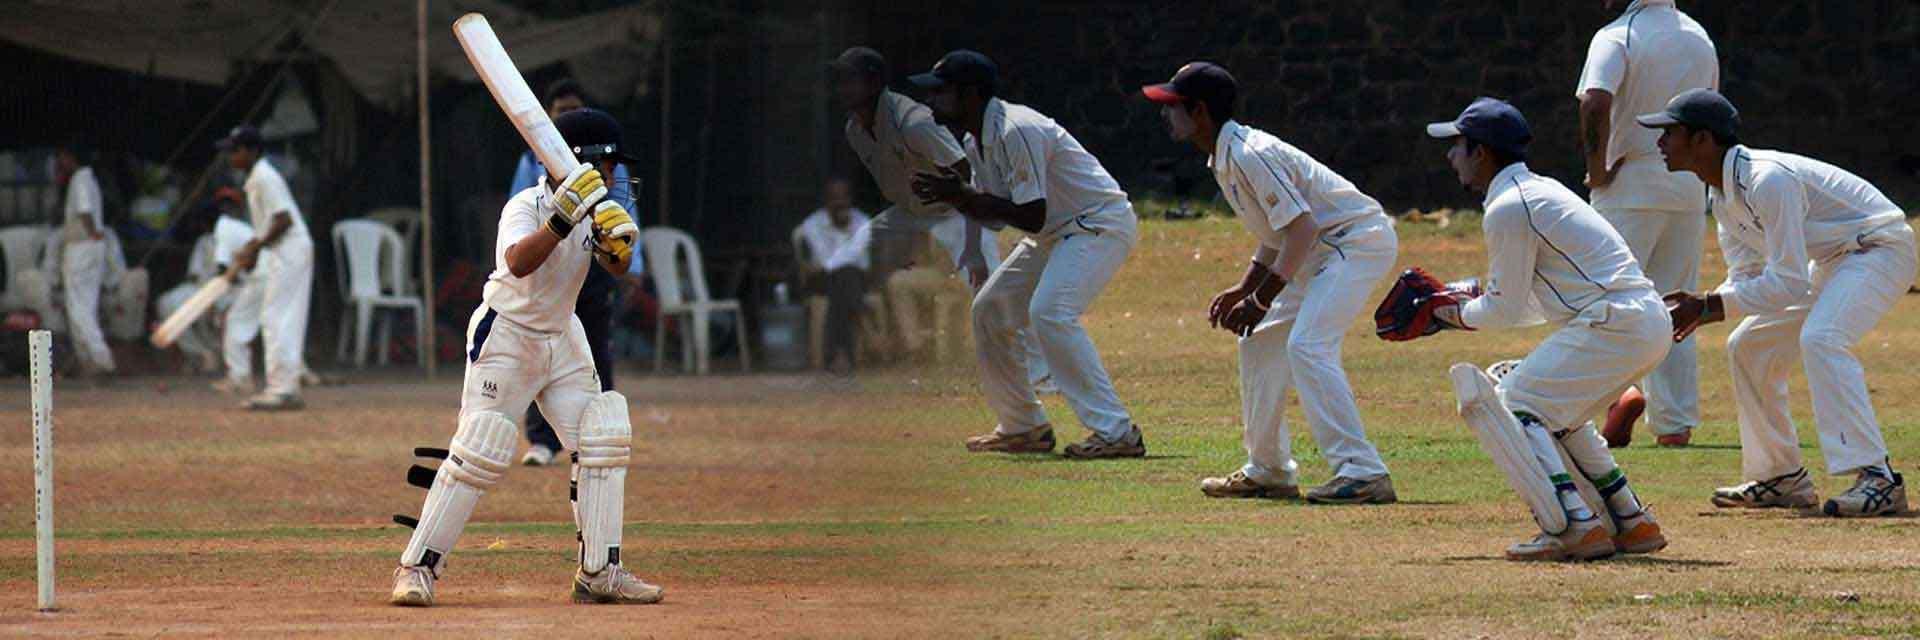 Indian Cricket League 2019 Apr 20 2019 Jun 20 2019